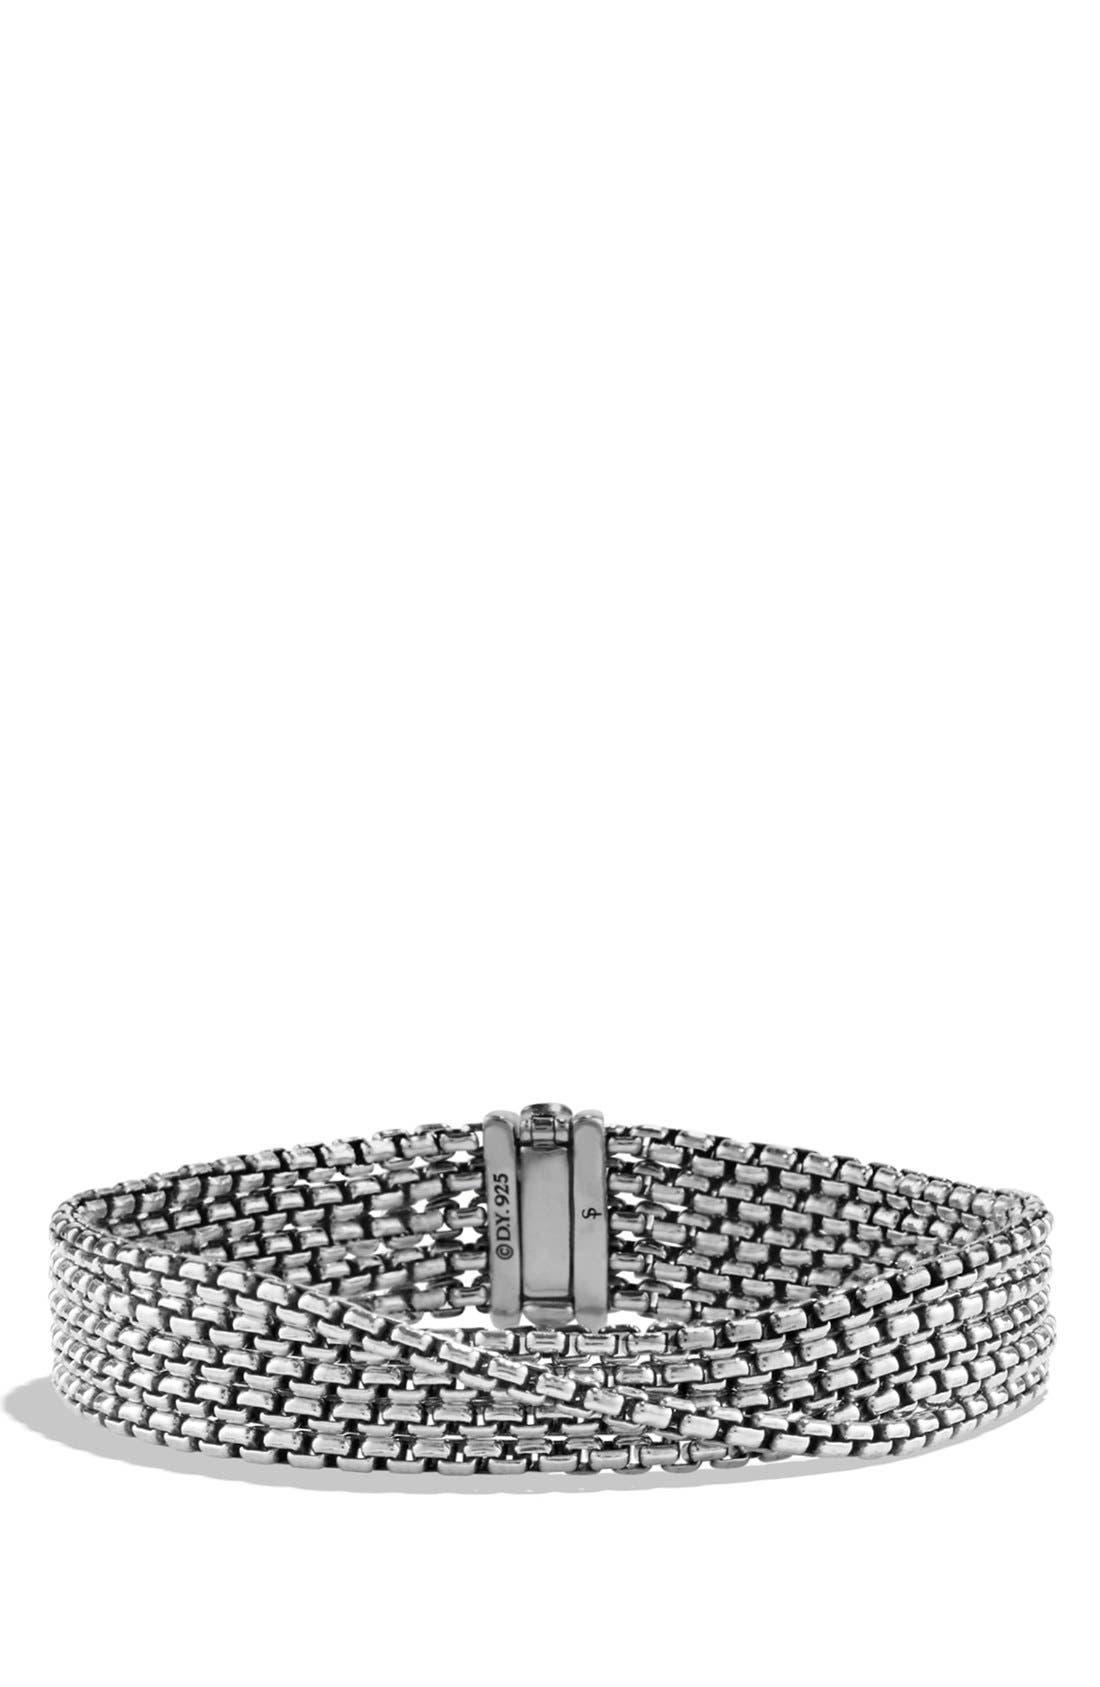 DAVID YURMAN 'Chain' Box Chain Five-Row Bracelet, Main, color, 040